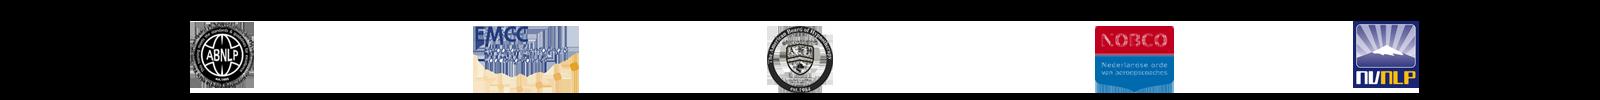 Website banner - logos 2